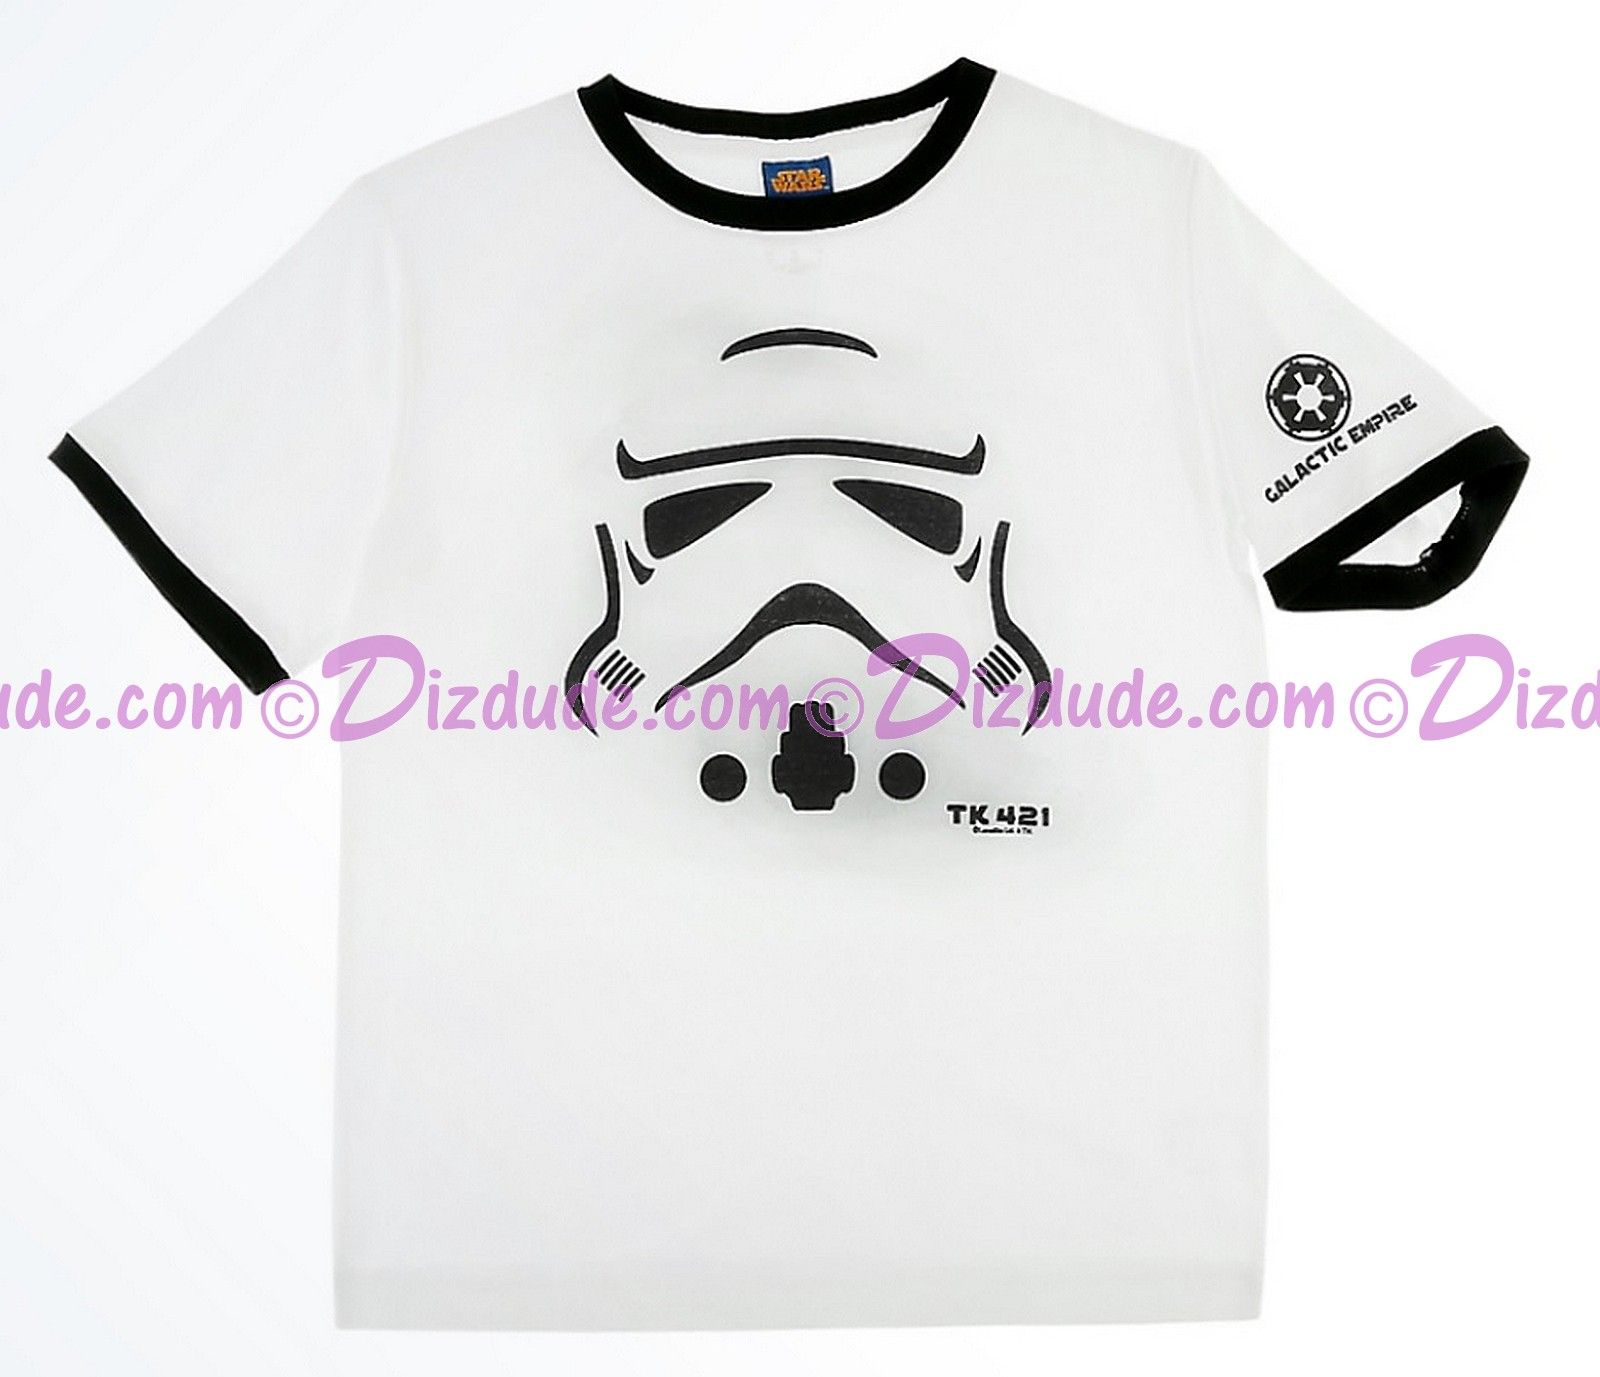 Star Wars Disney Stormtrooper TK 421 Youth T-Shirt (Tshirt, T shirt or Tee) © Dizdude.com